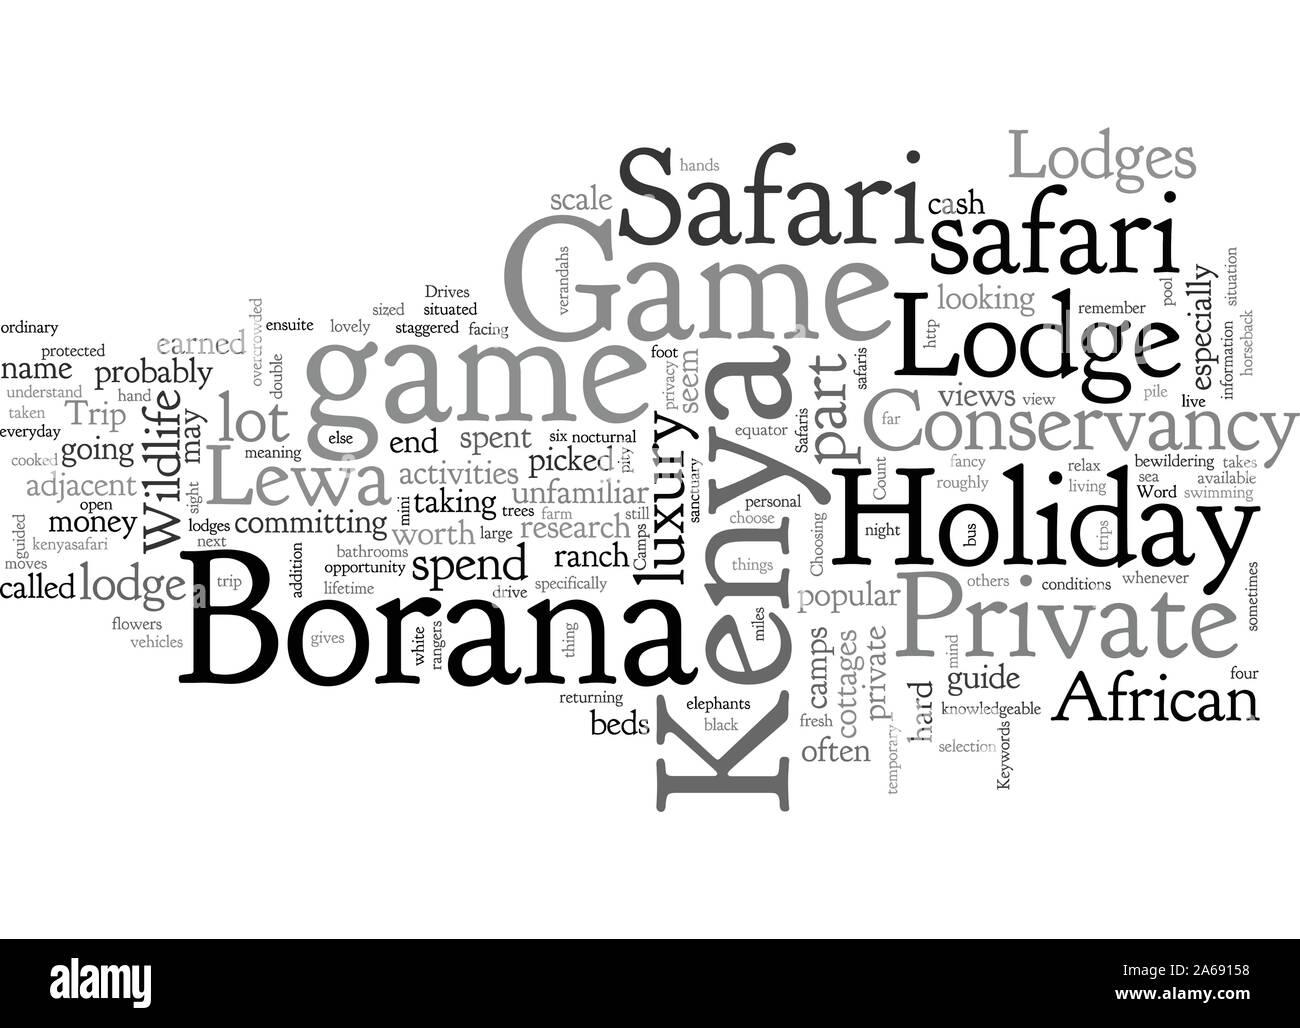 A Kenya Safari Holiday At A Private Game Lodge Next To The Lewa Conservancy Stock Vector